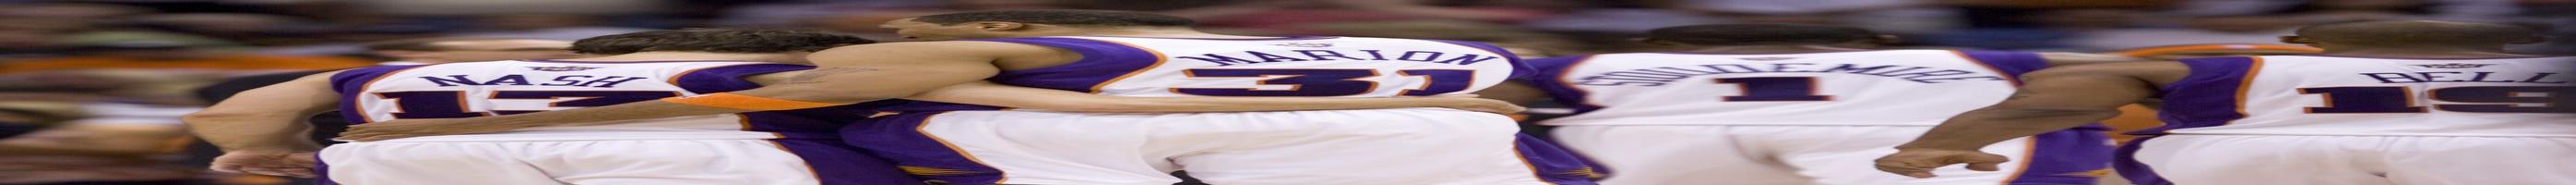 Suns 1st-round pick rankings: Where's Amar'e?